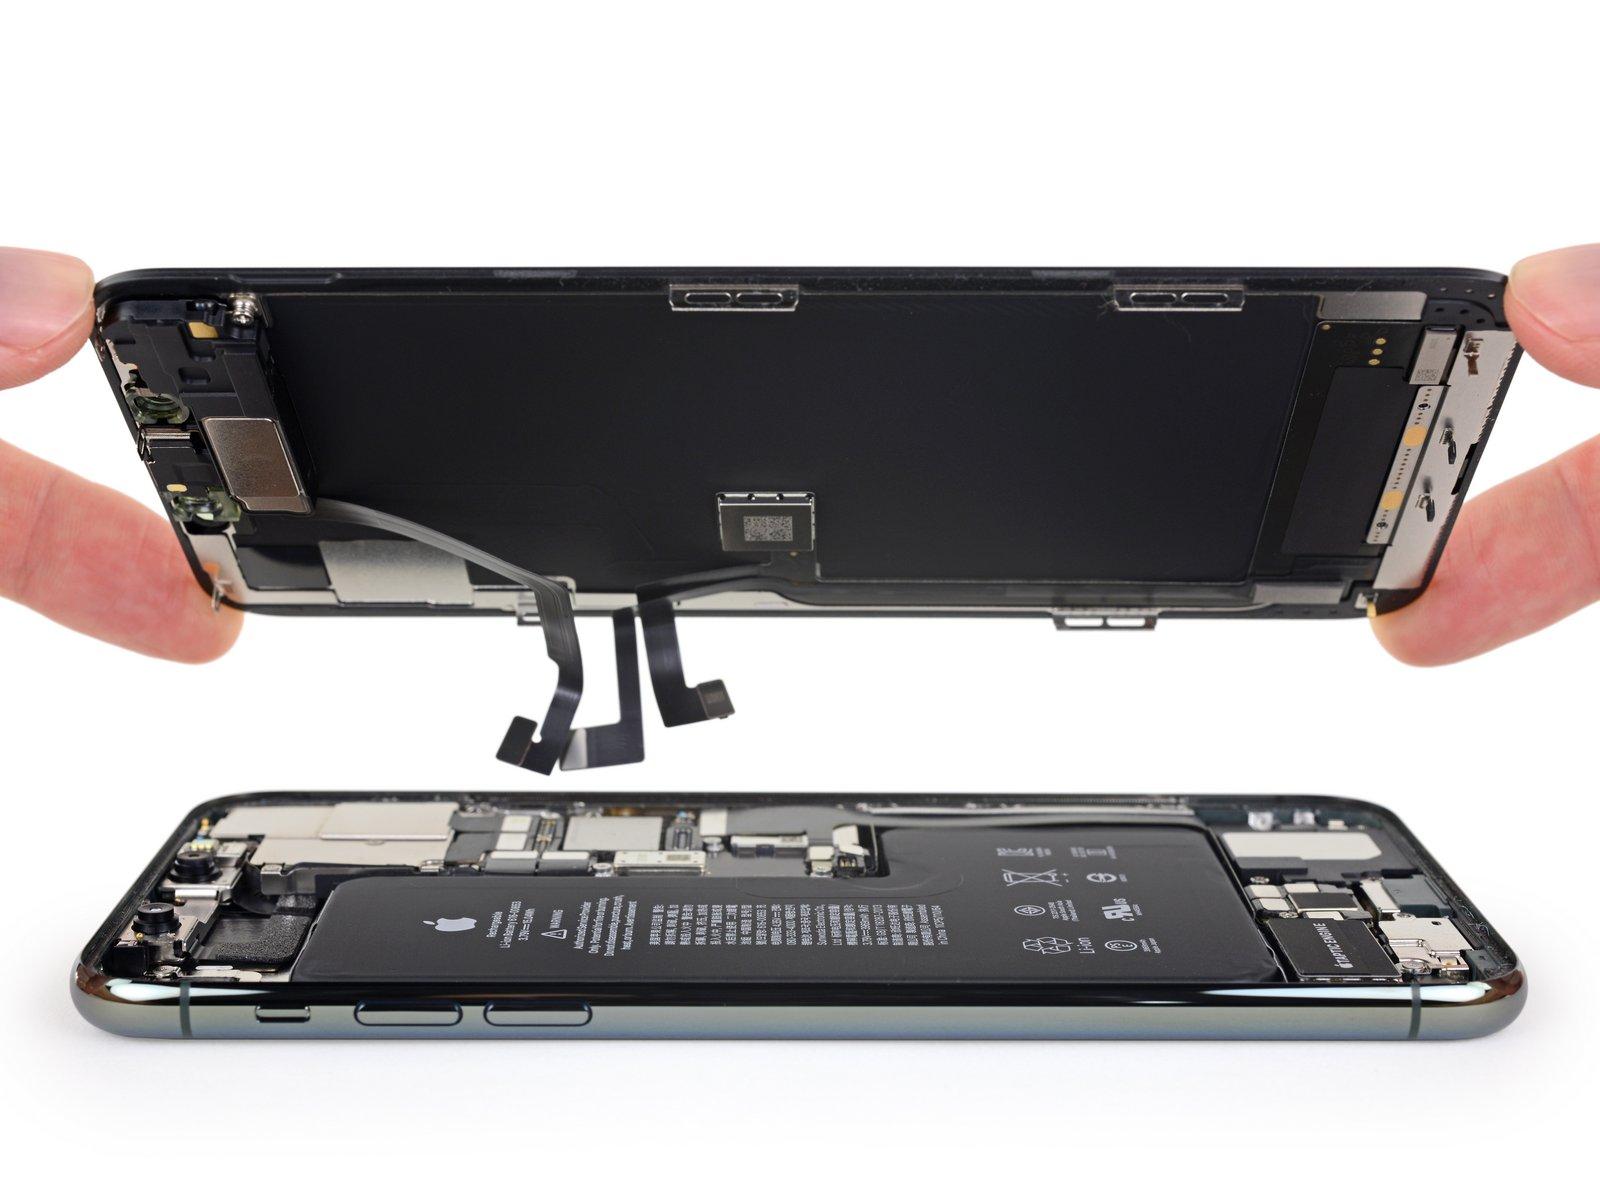 iPhone 11 Pro Max 详尽拆解 双层超小主板的照片 - 15